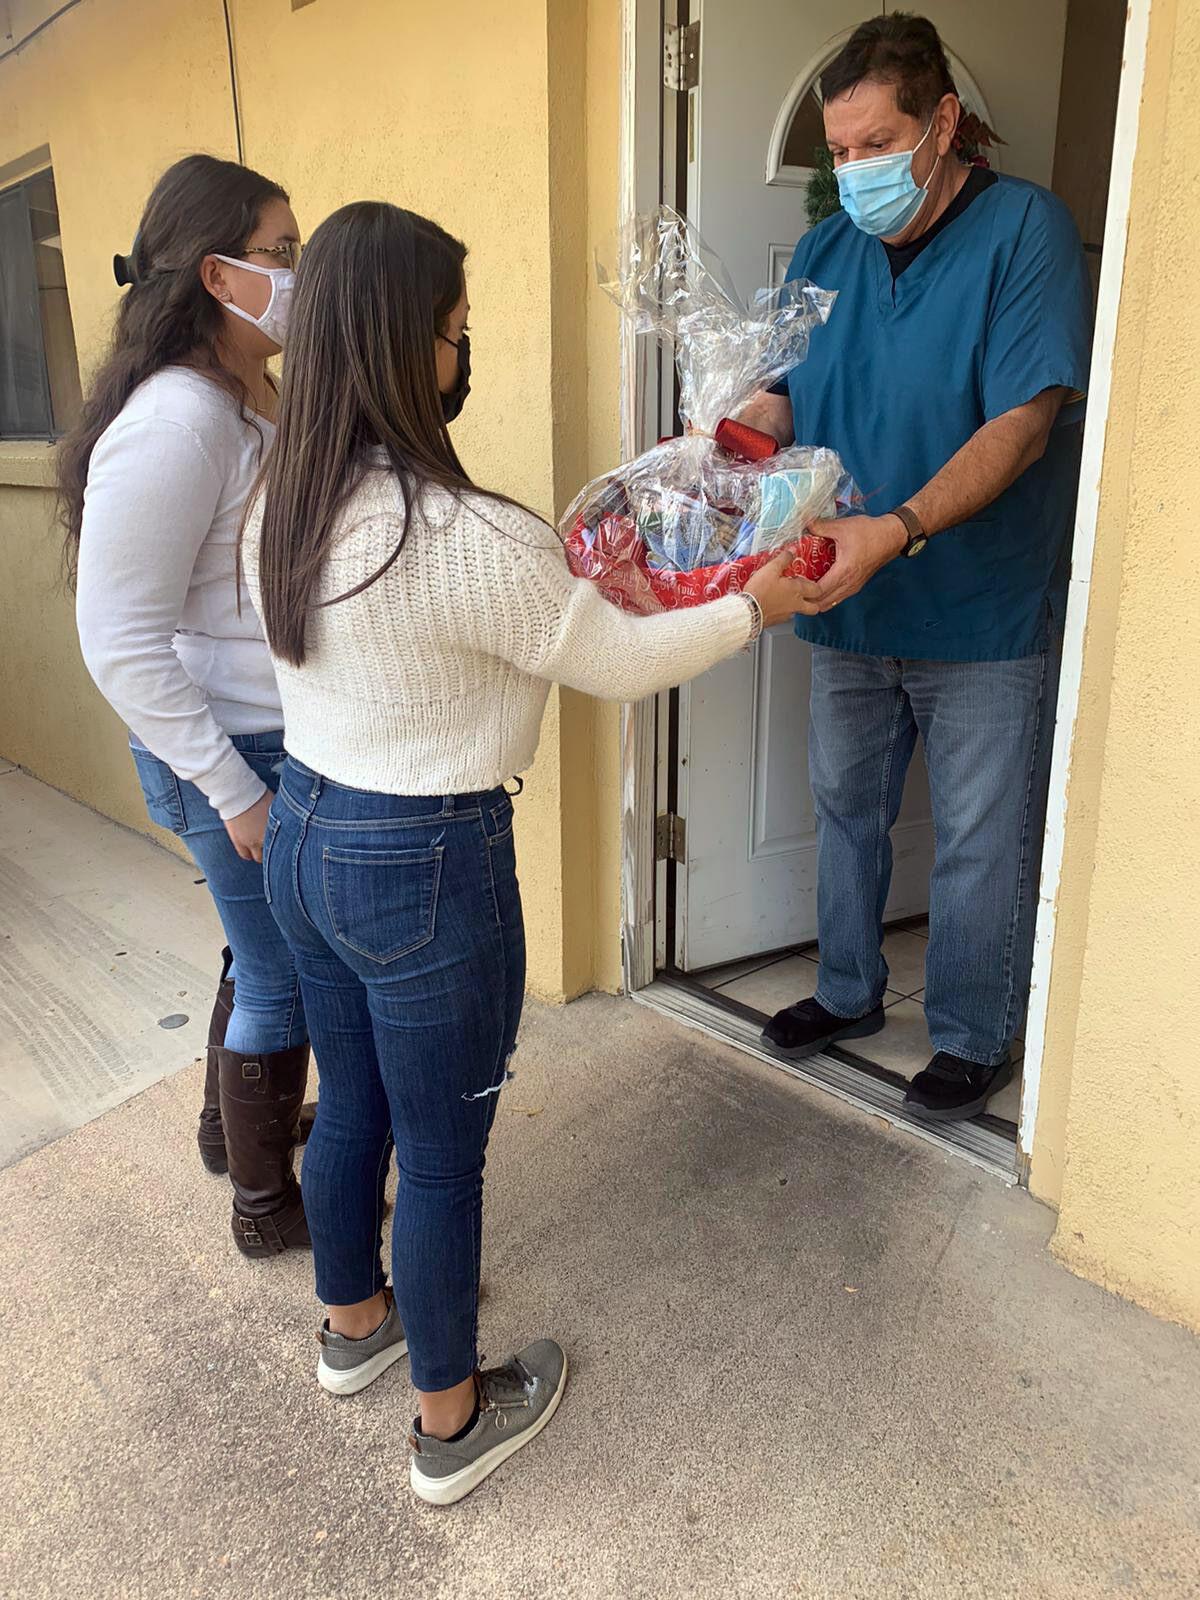 Future Health Leaders gift baskets